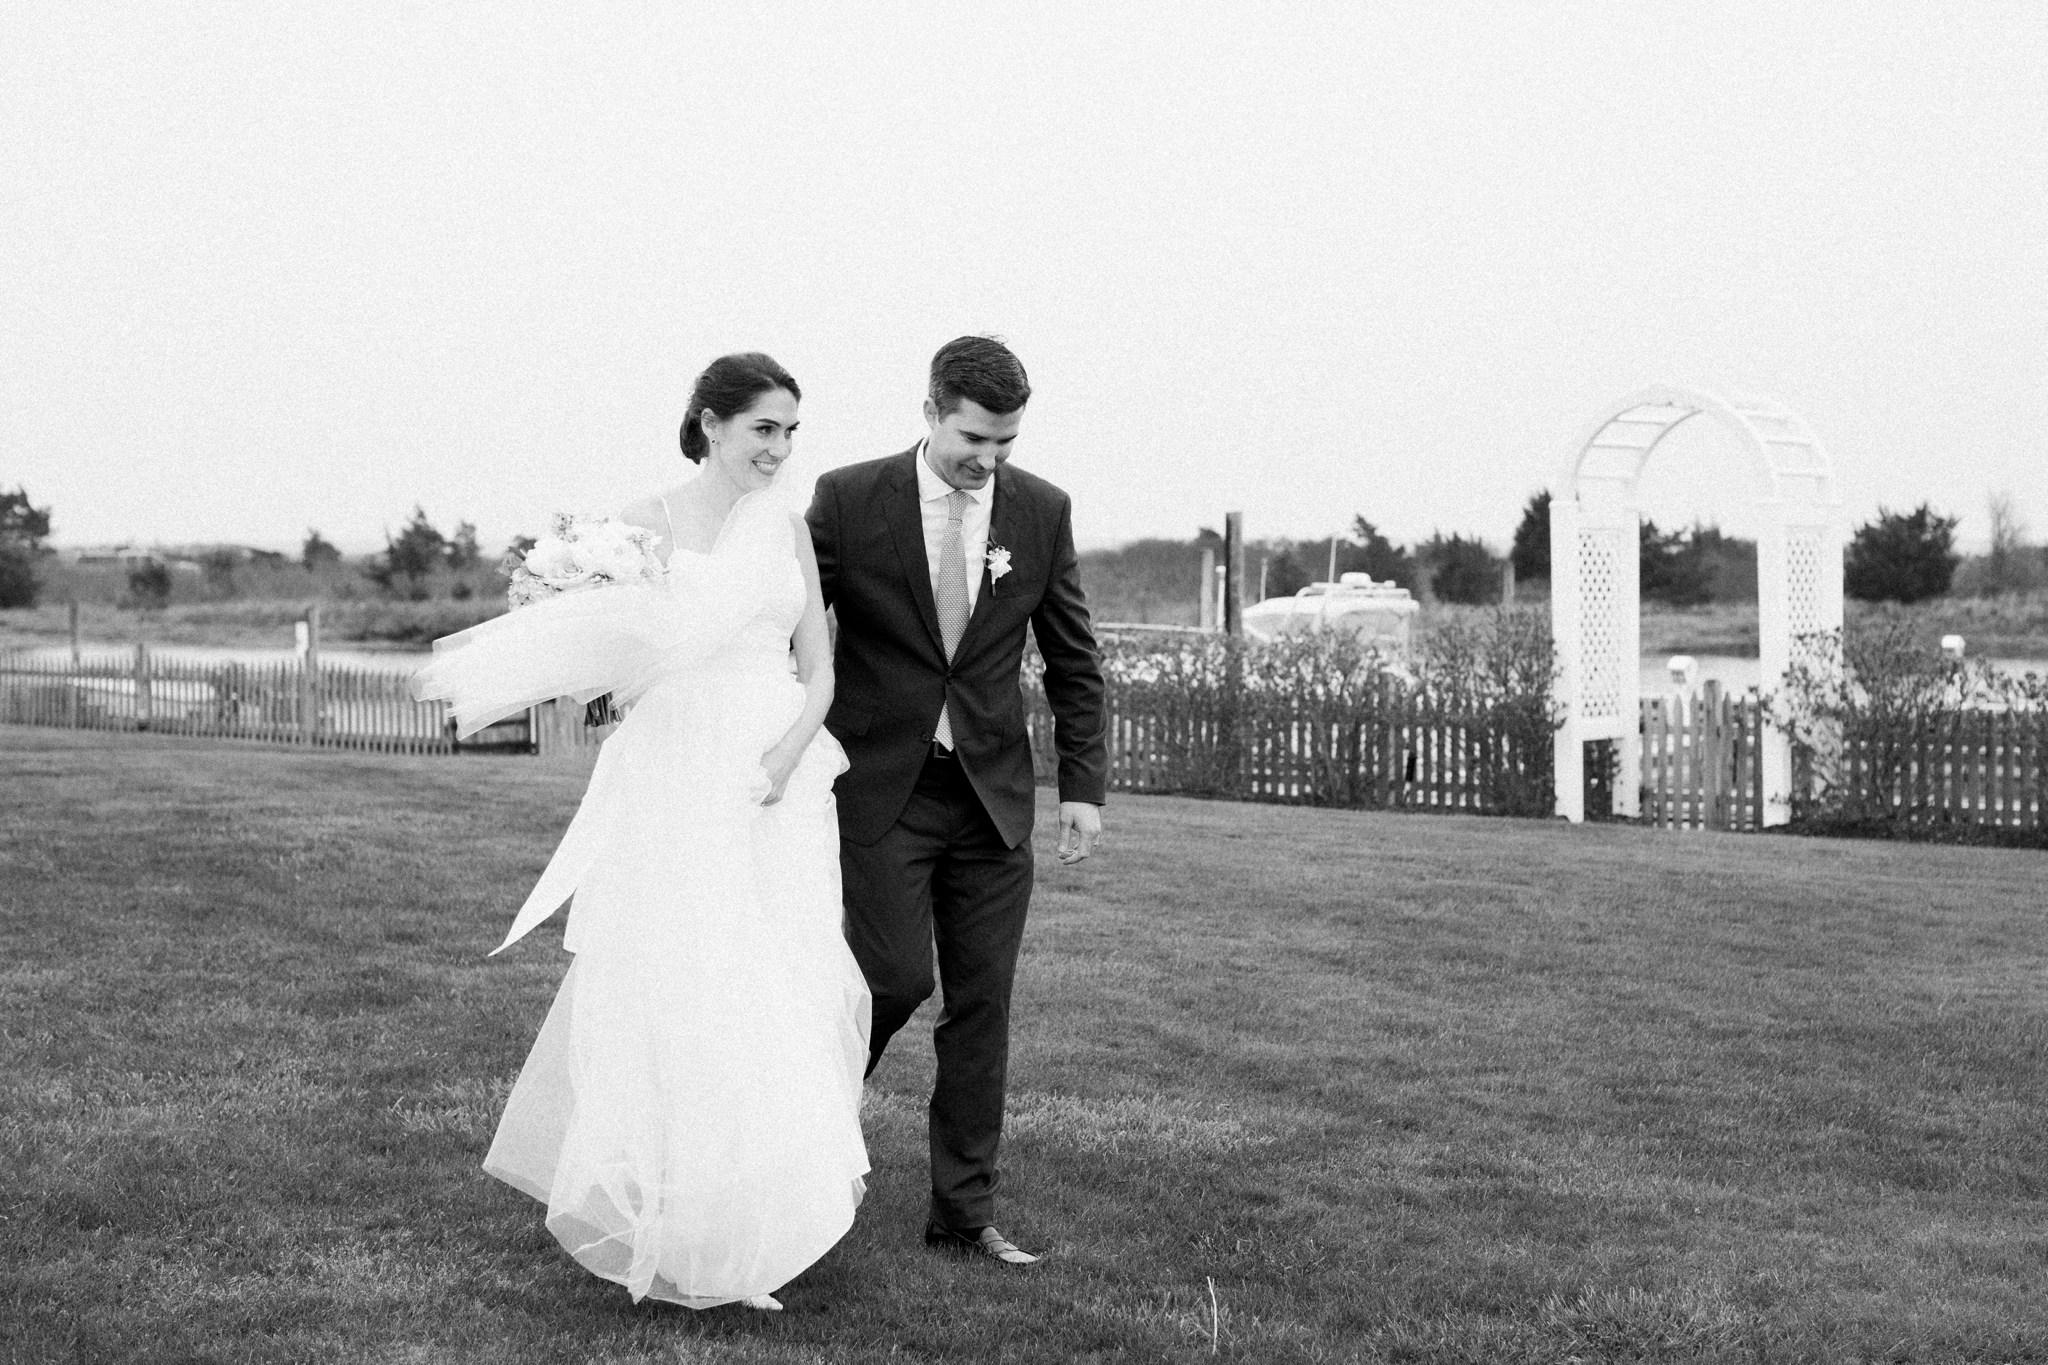 cape_cod_wedding_deborah_zoe_Photography_00061.JPG